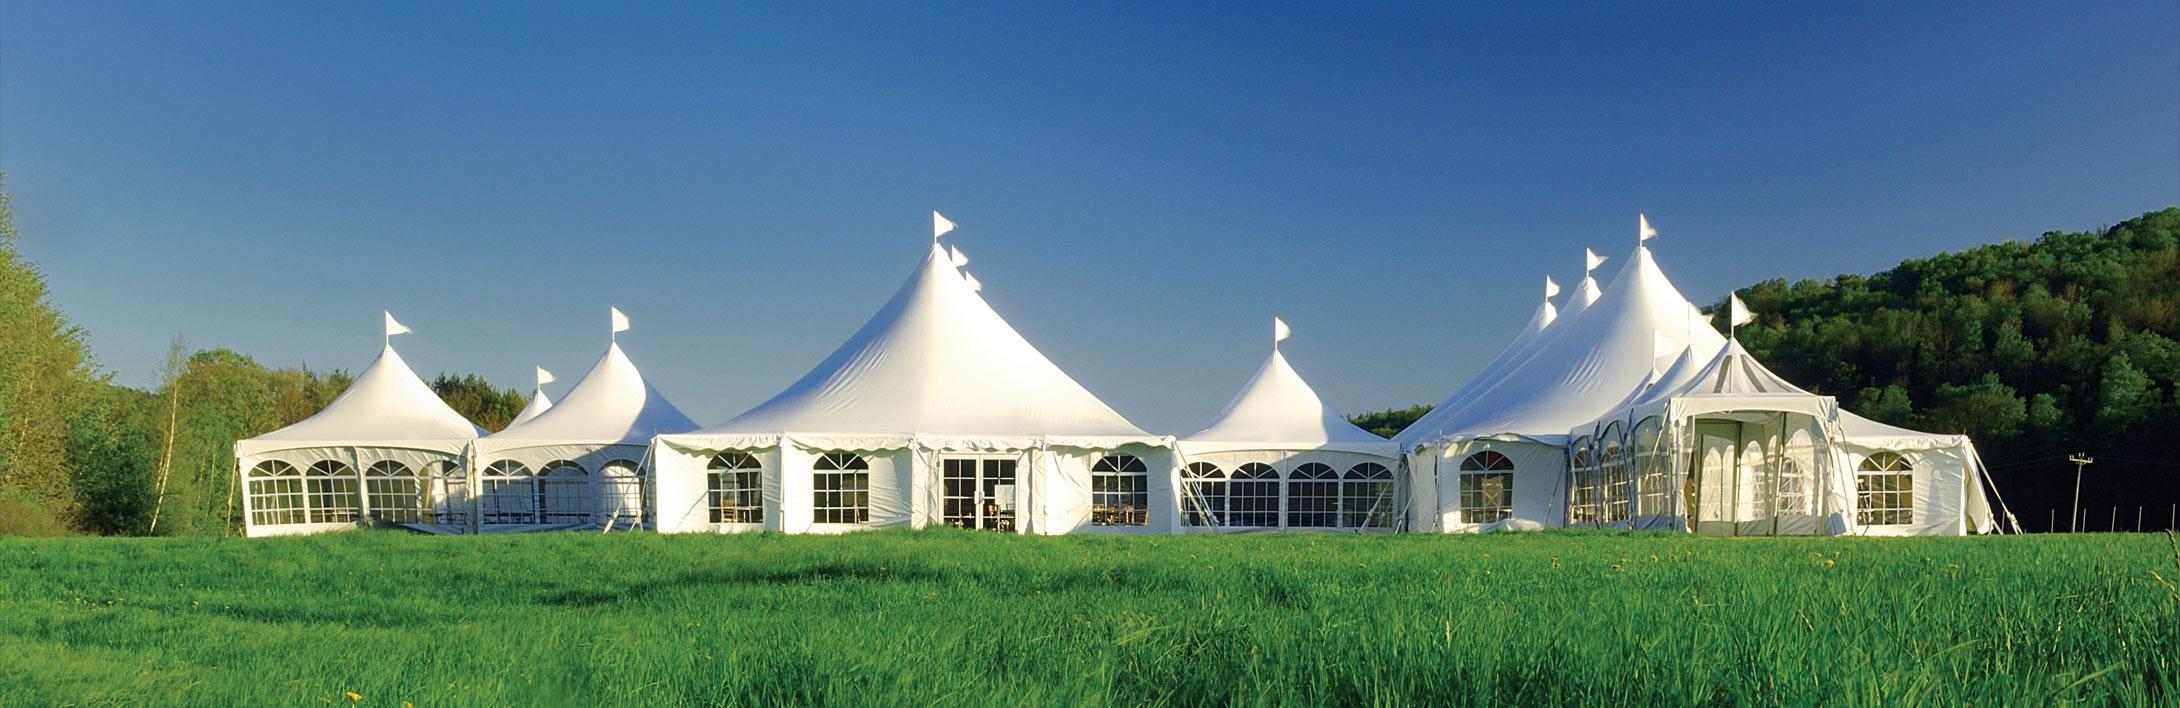 photo gallery wedding tent rentals Photo Gallery